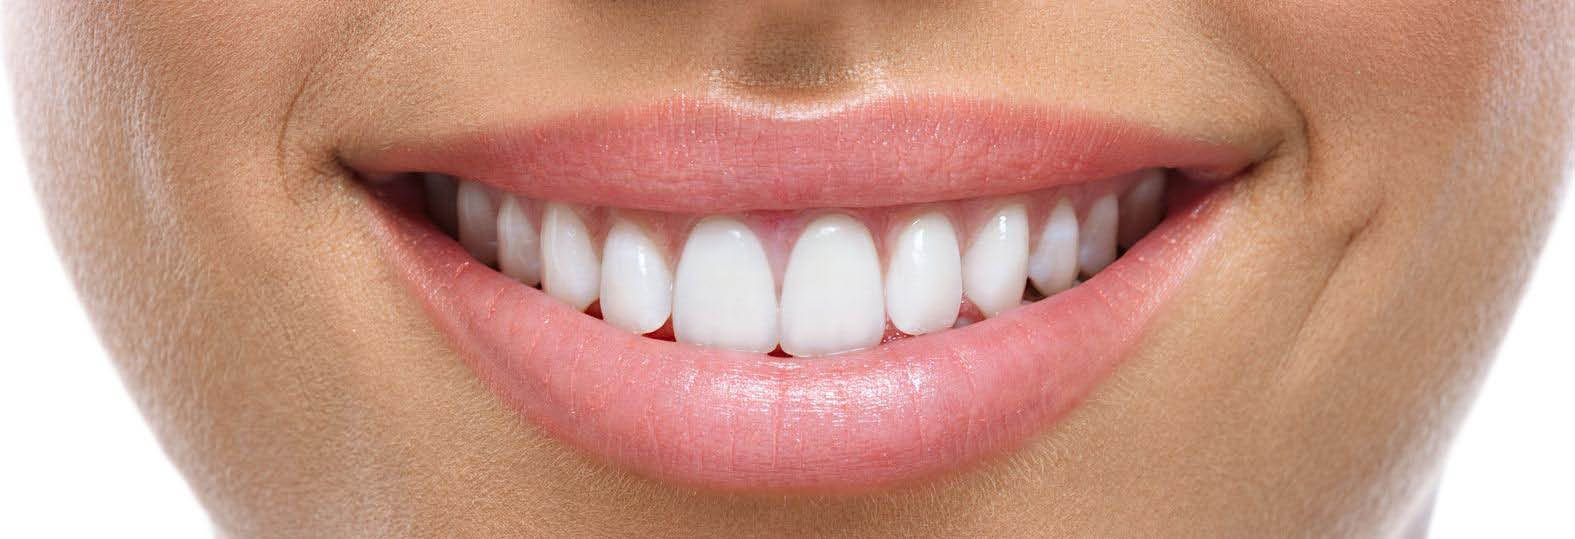 MK Dental family dentistry